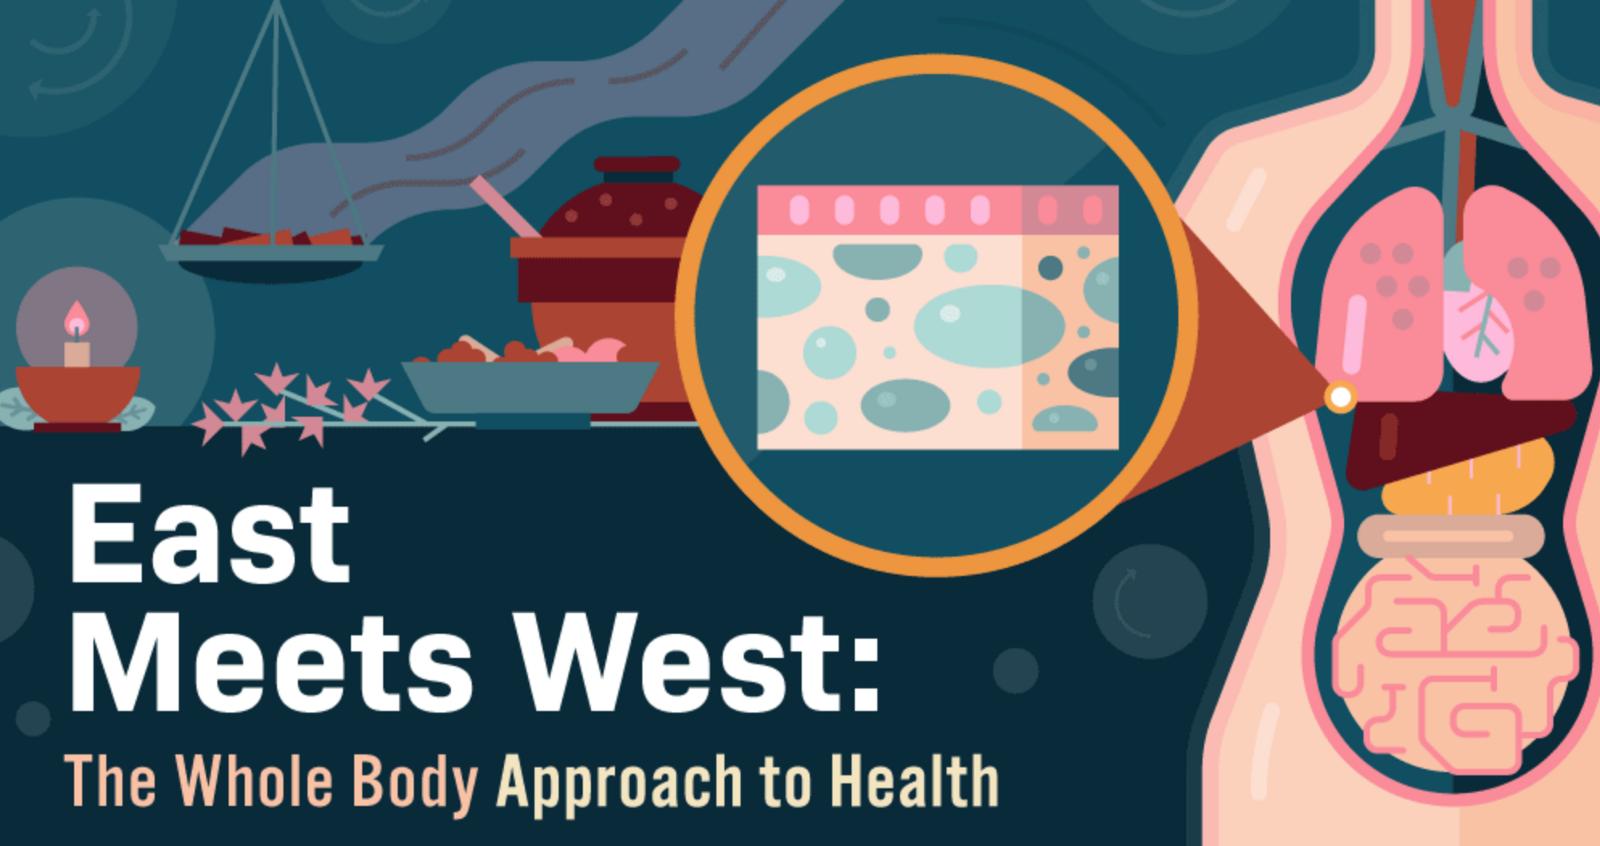 /how-to-bridge-the-gap-of-eastern-vs-western-medicine-ec9c2ca8e410 feature image